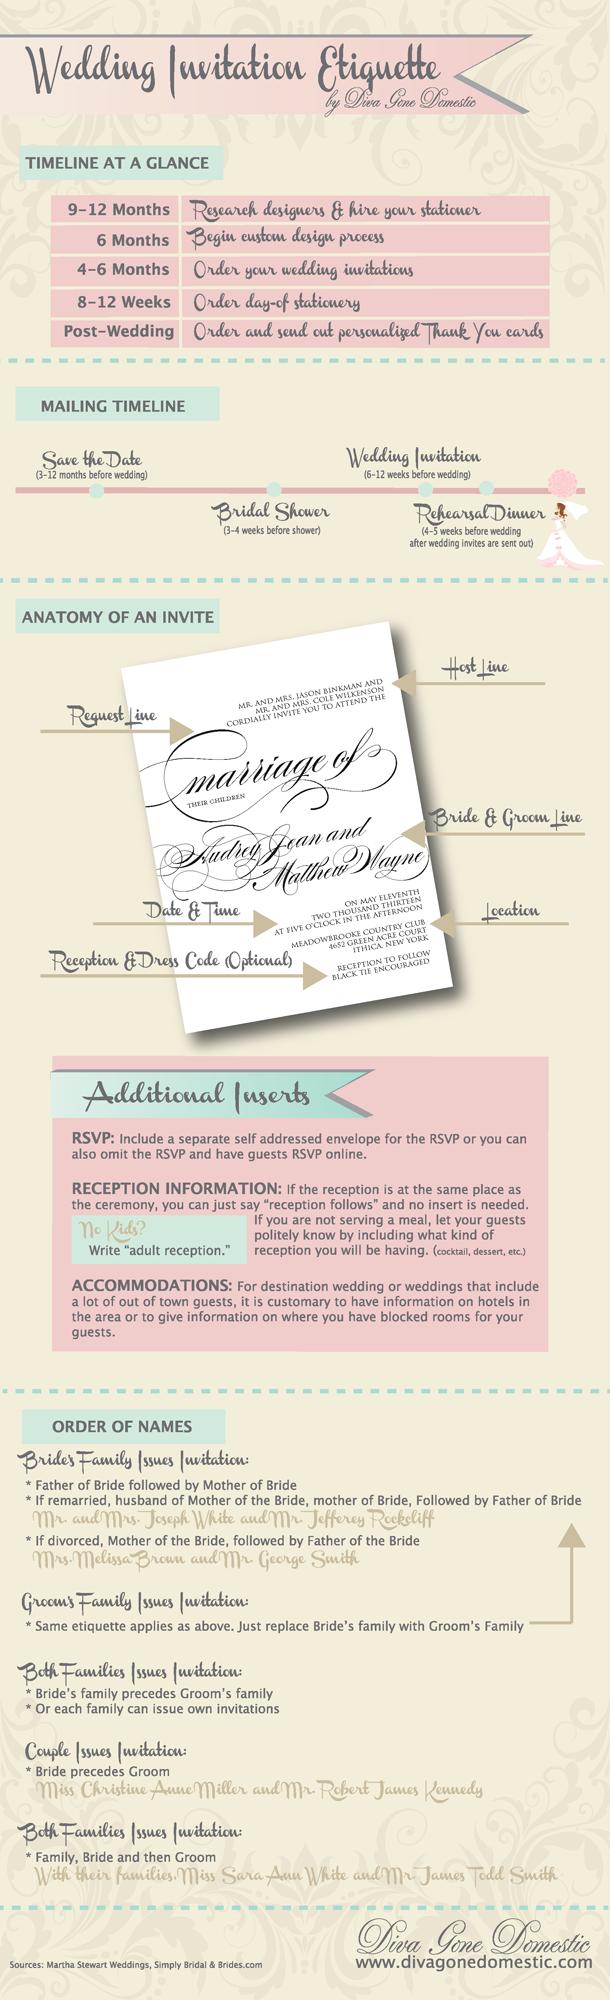 25 Informal Wedding Invitation Wording Ideas | Etiquette, Timeline ...